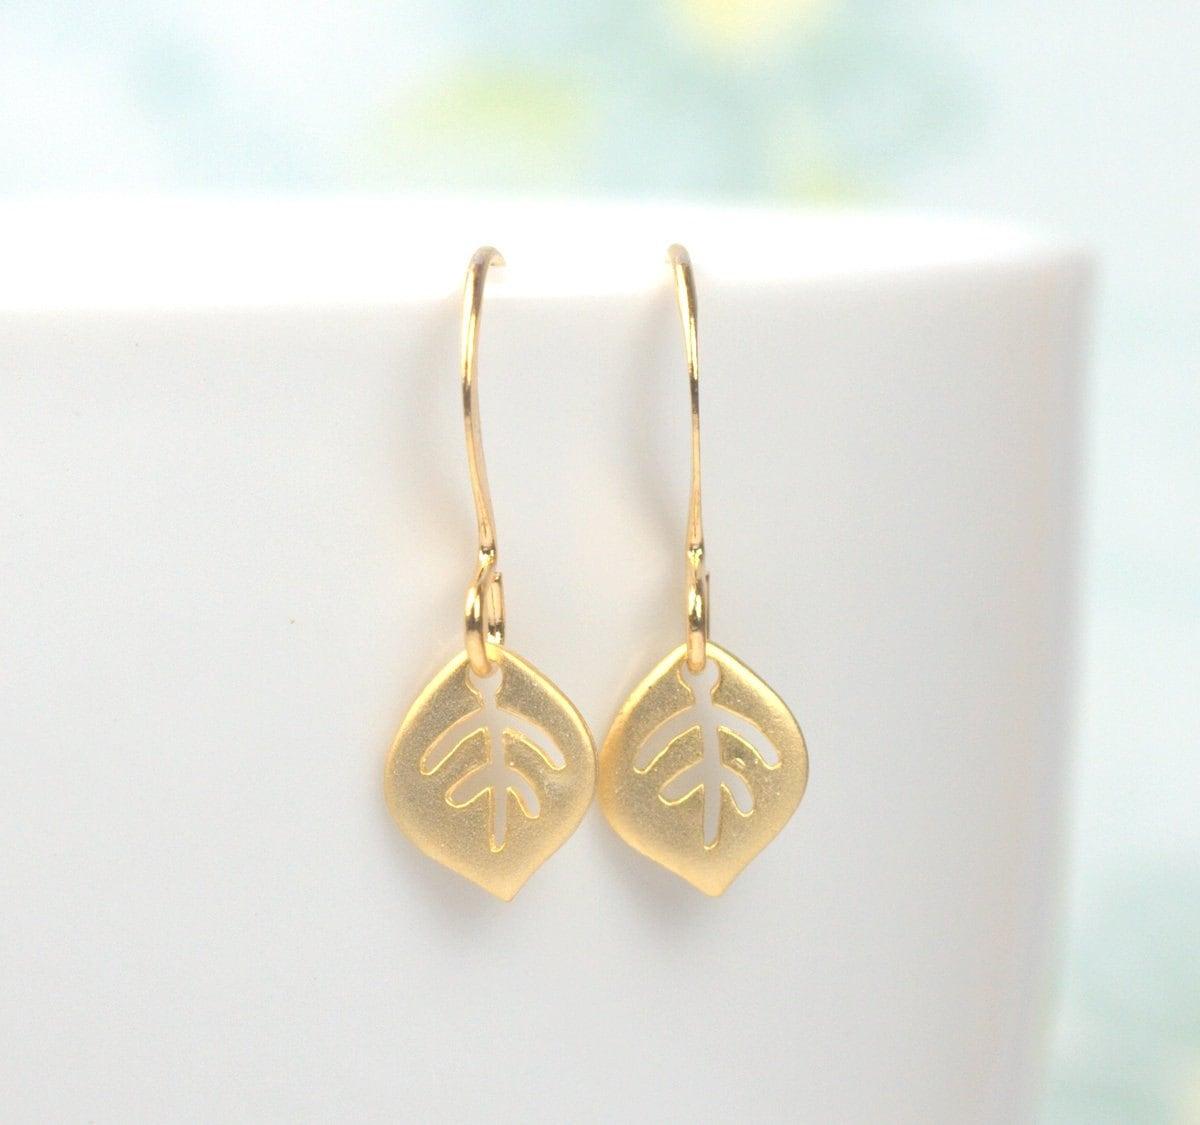 Tiny Gold Leaf Dangle Earrings Gold Earrings Small Drop